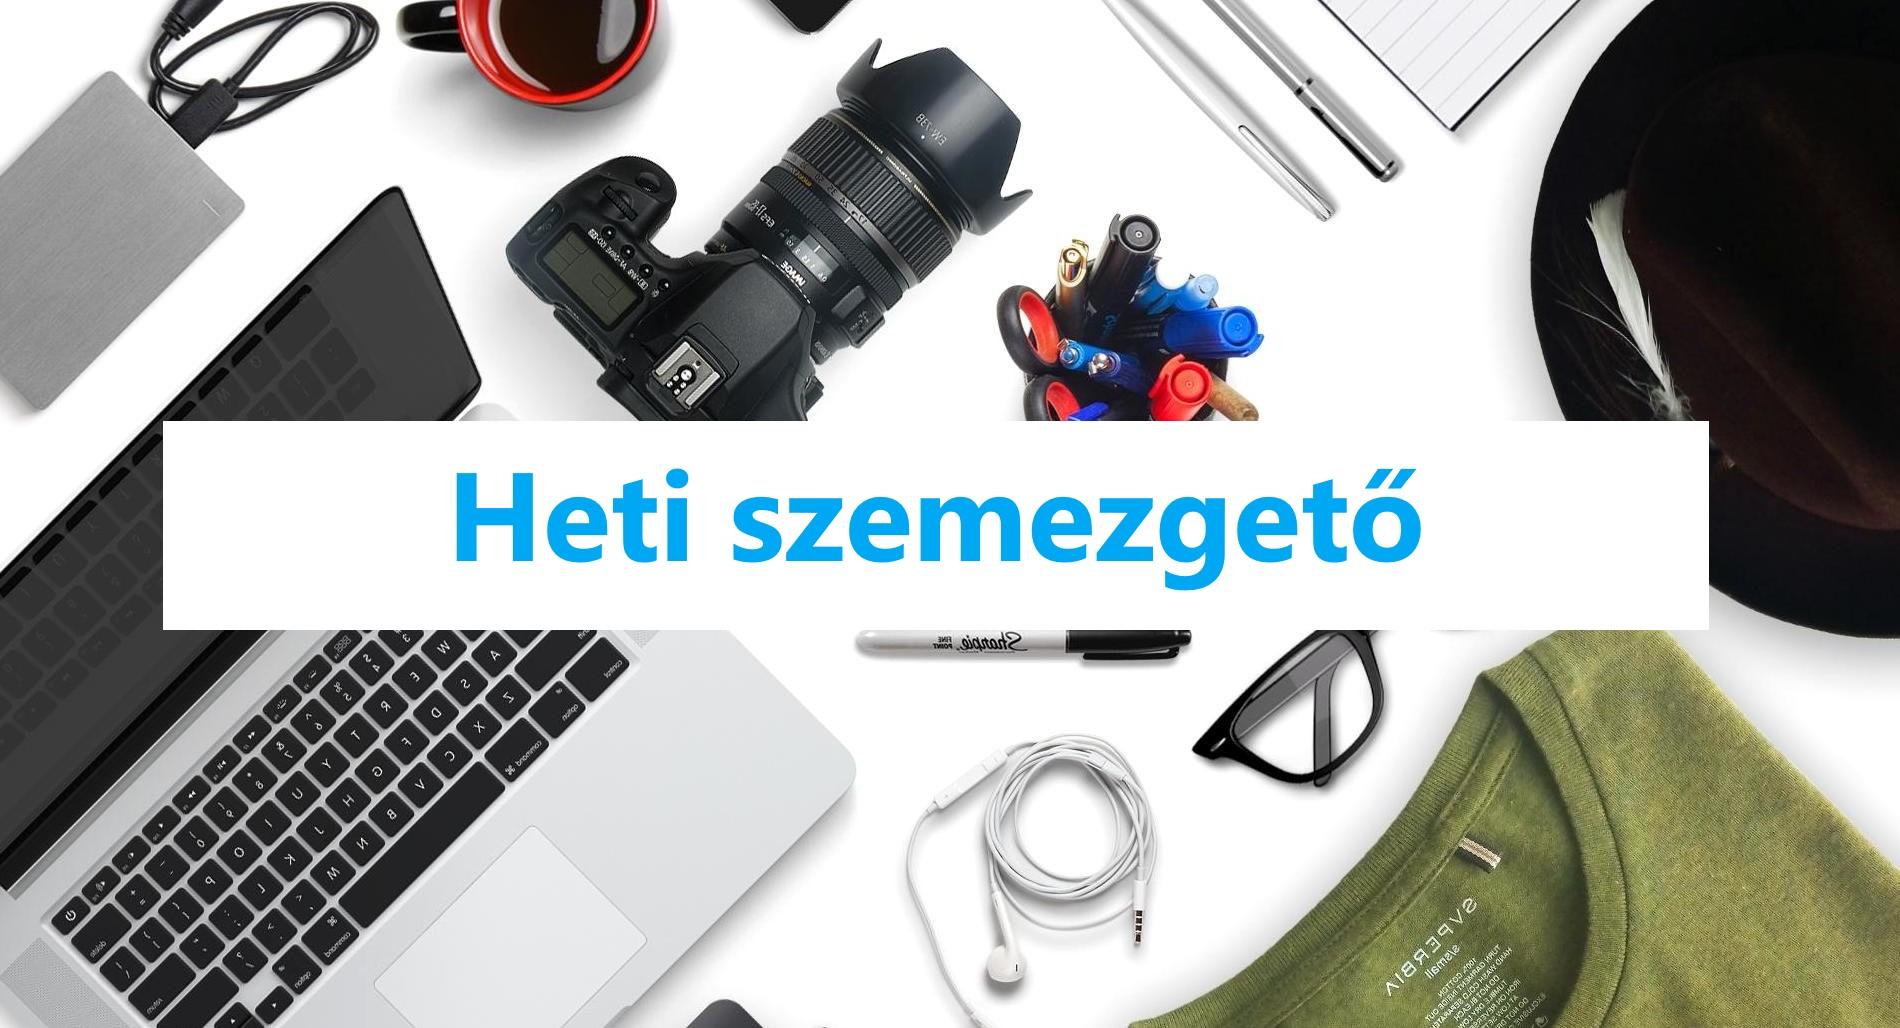 heti_szemezgeto_uj_43.jpg